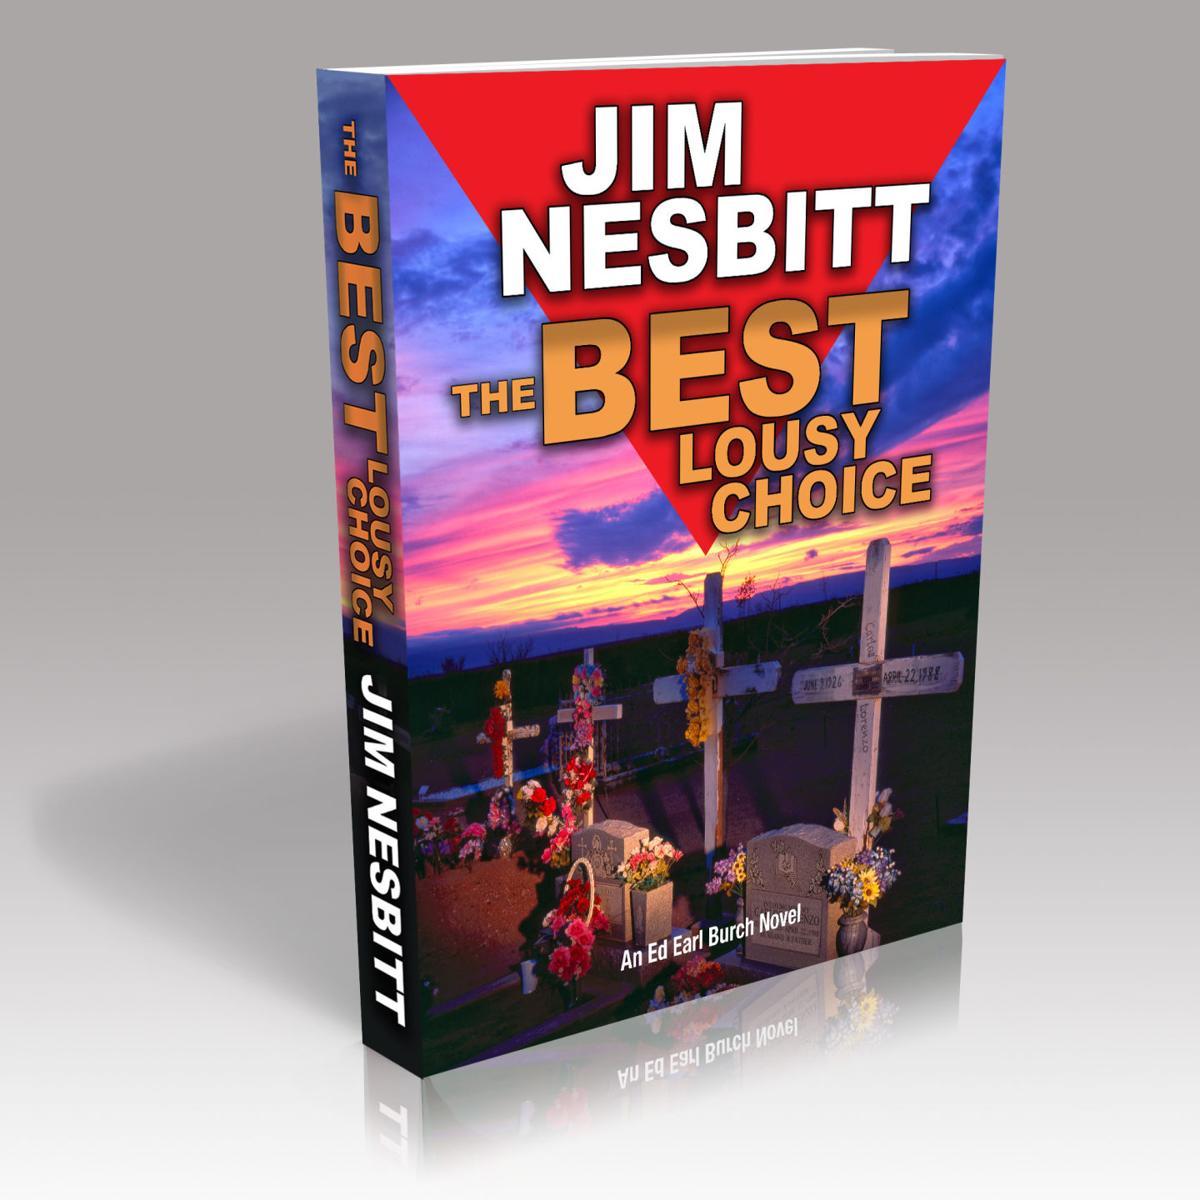 """The Best Lousy Choice"" by Jim Nesbitt"